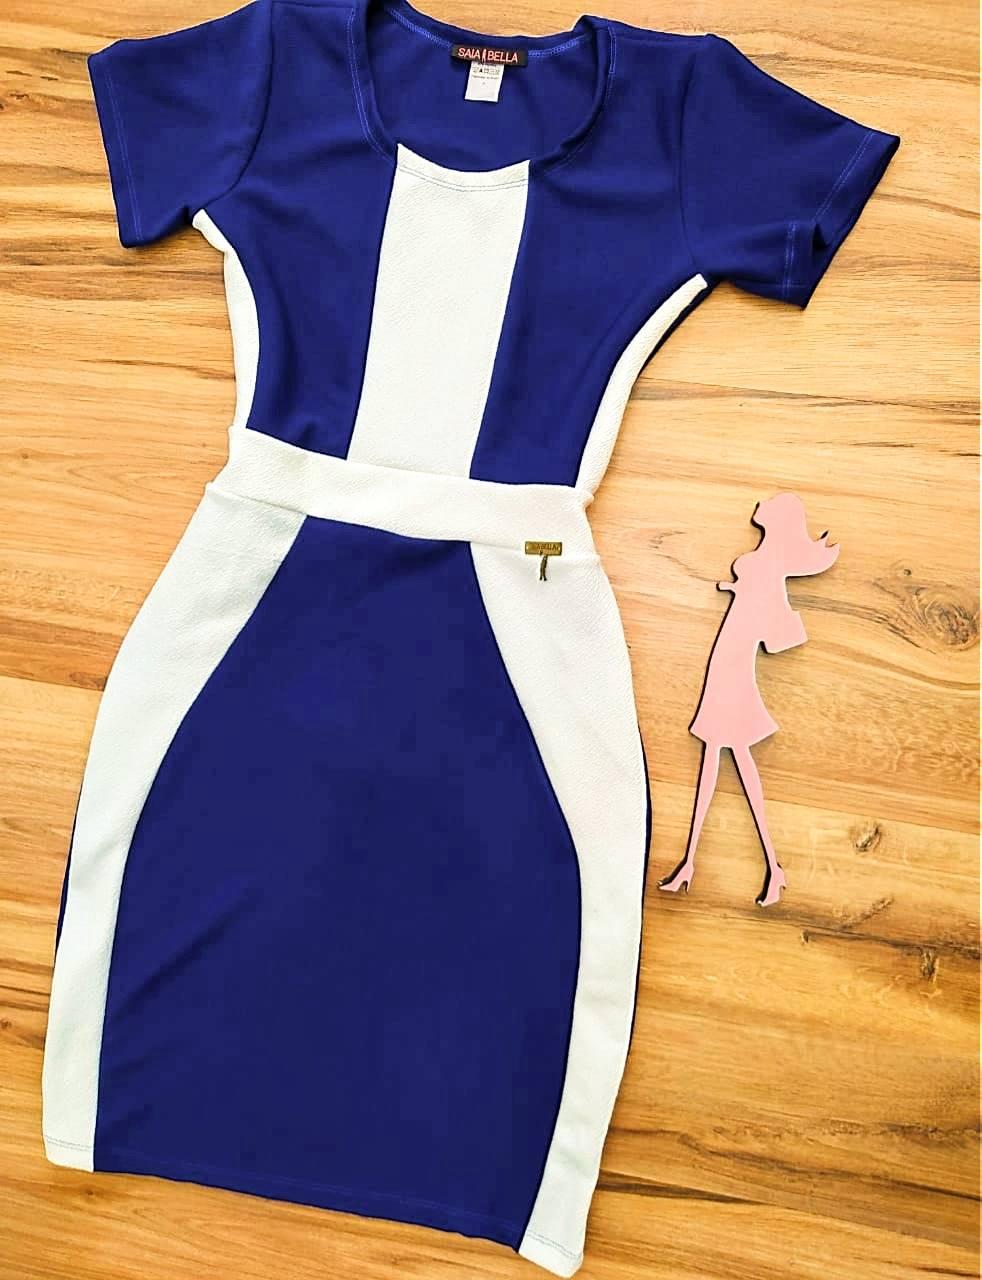 Vestido Brenda modelo Tubinho Saia Bella SB774010 - Azul